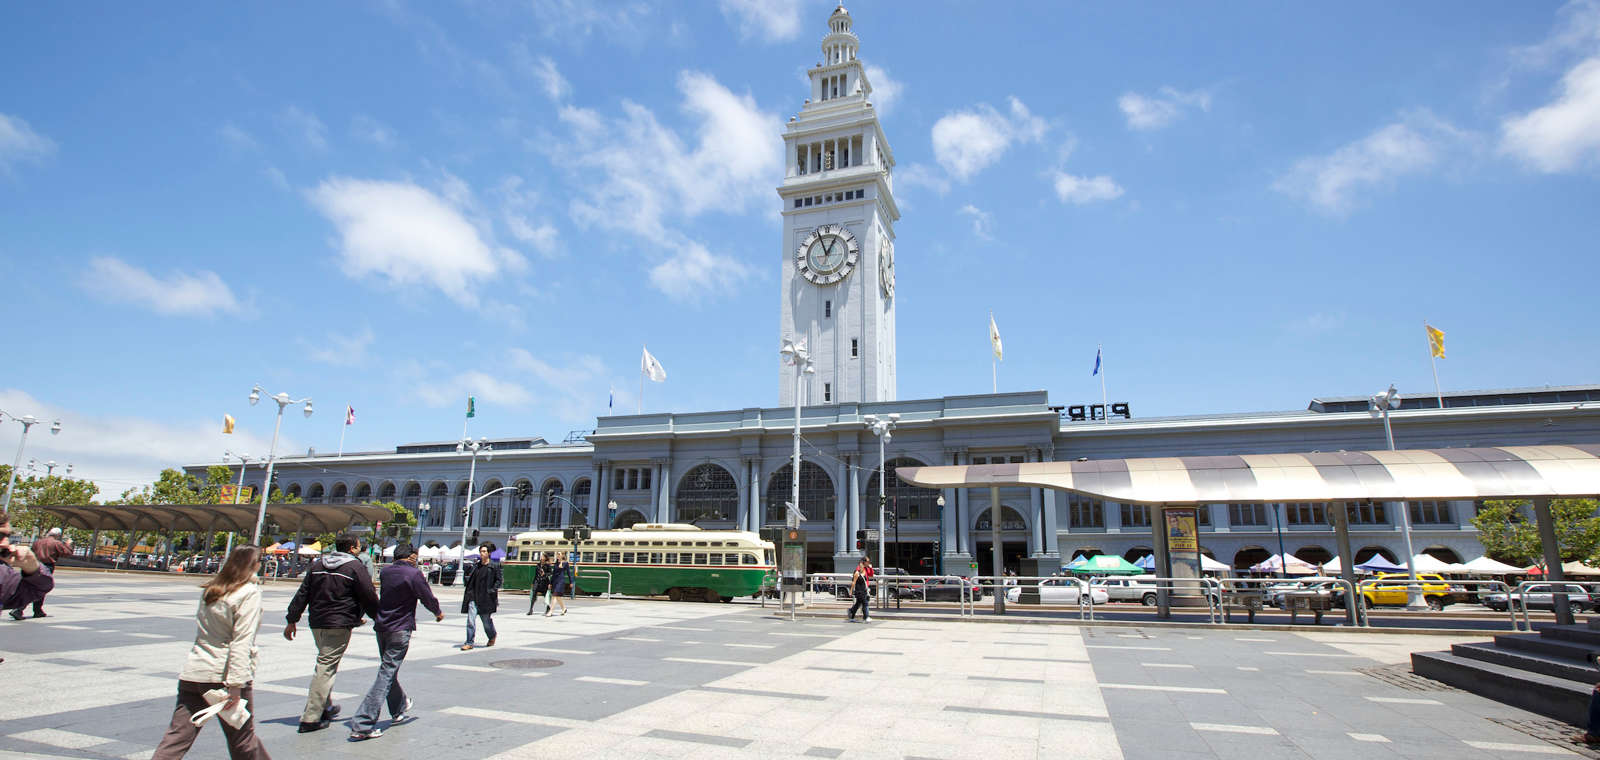 Exterior of San Francisco Ferry Building